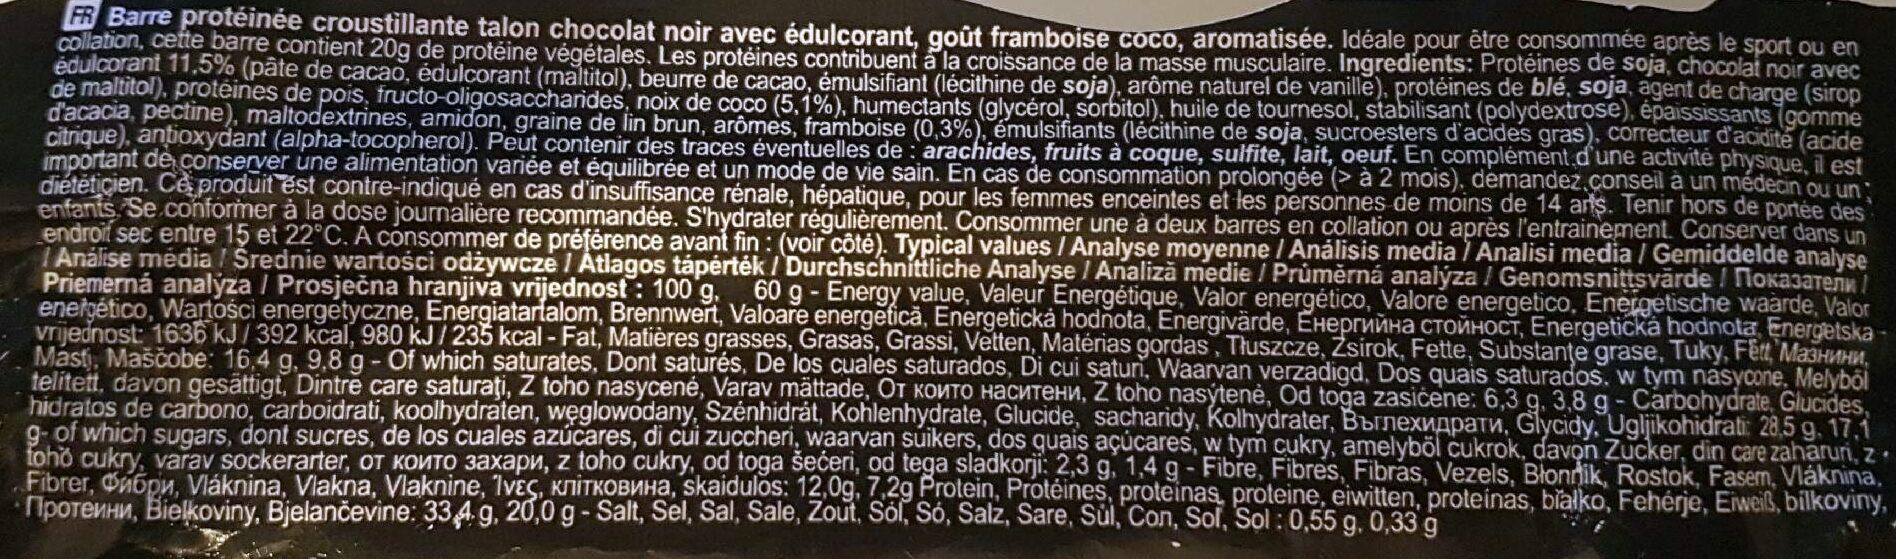 VEGAN protein bar - Ingrédients - fr